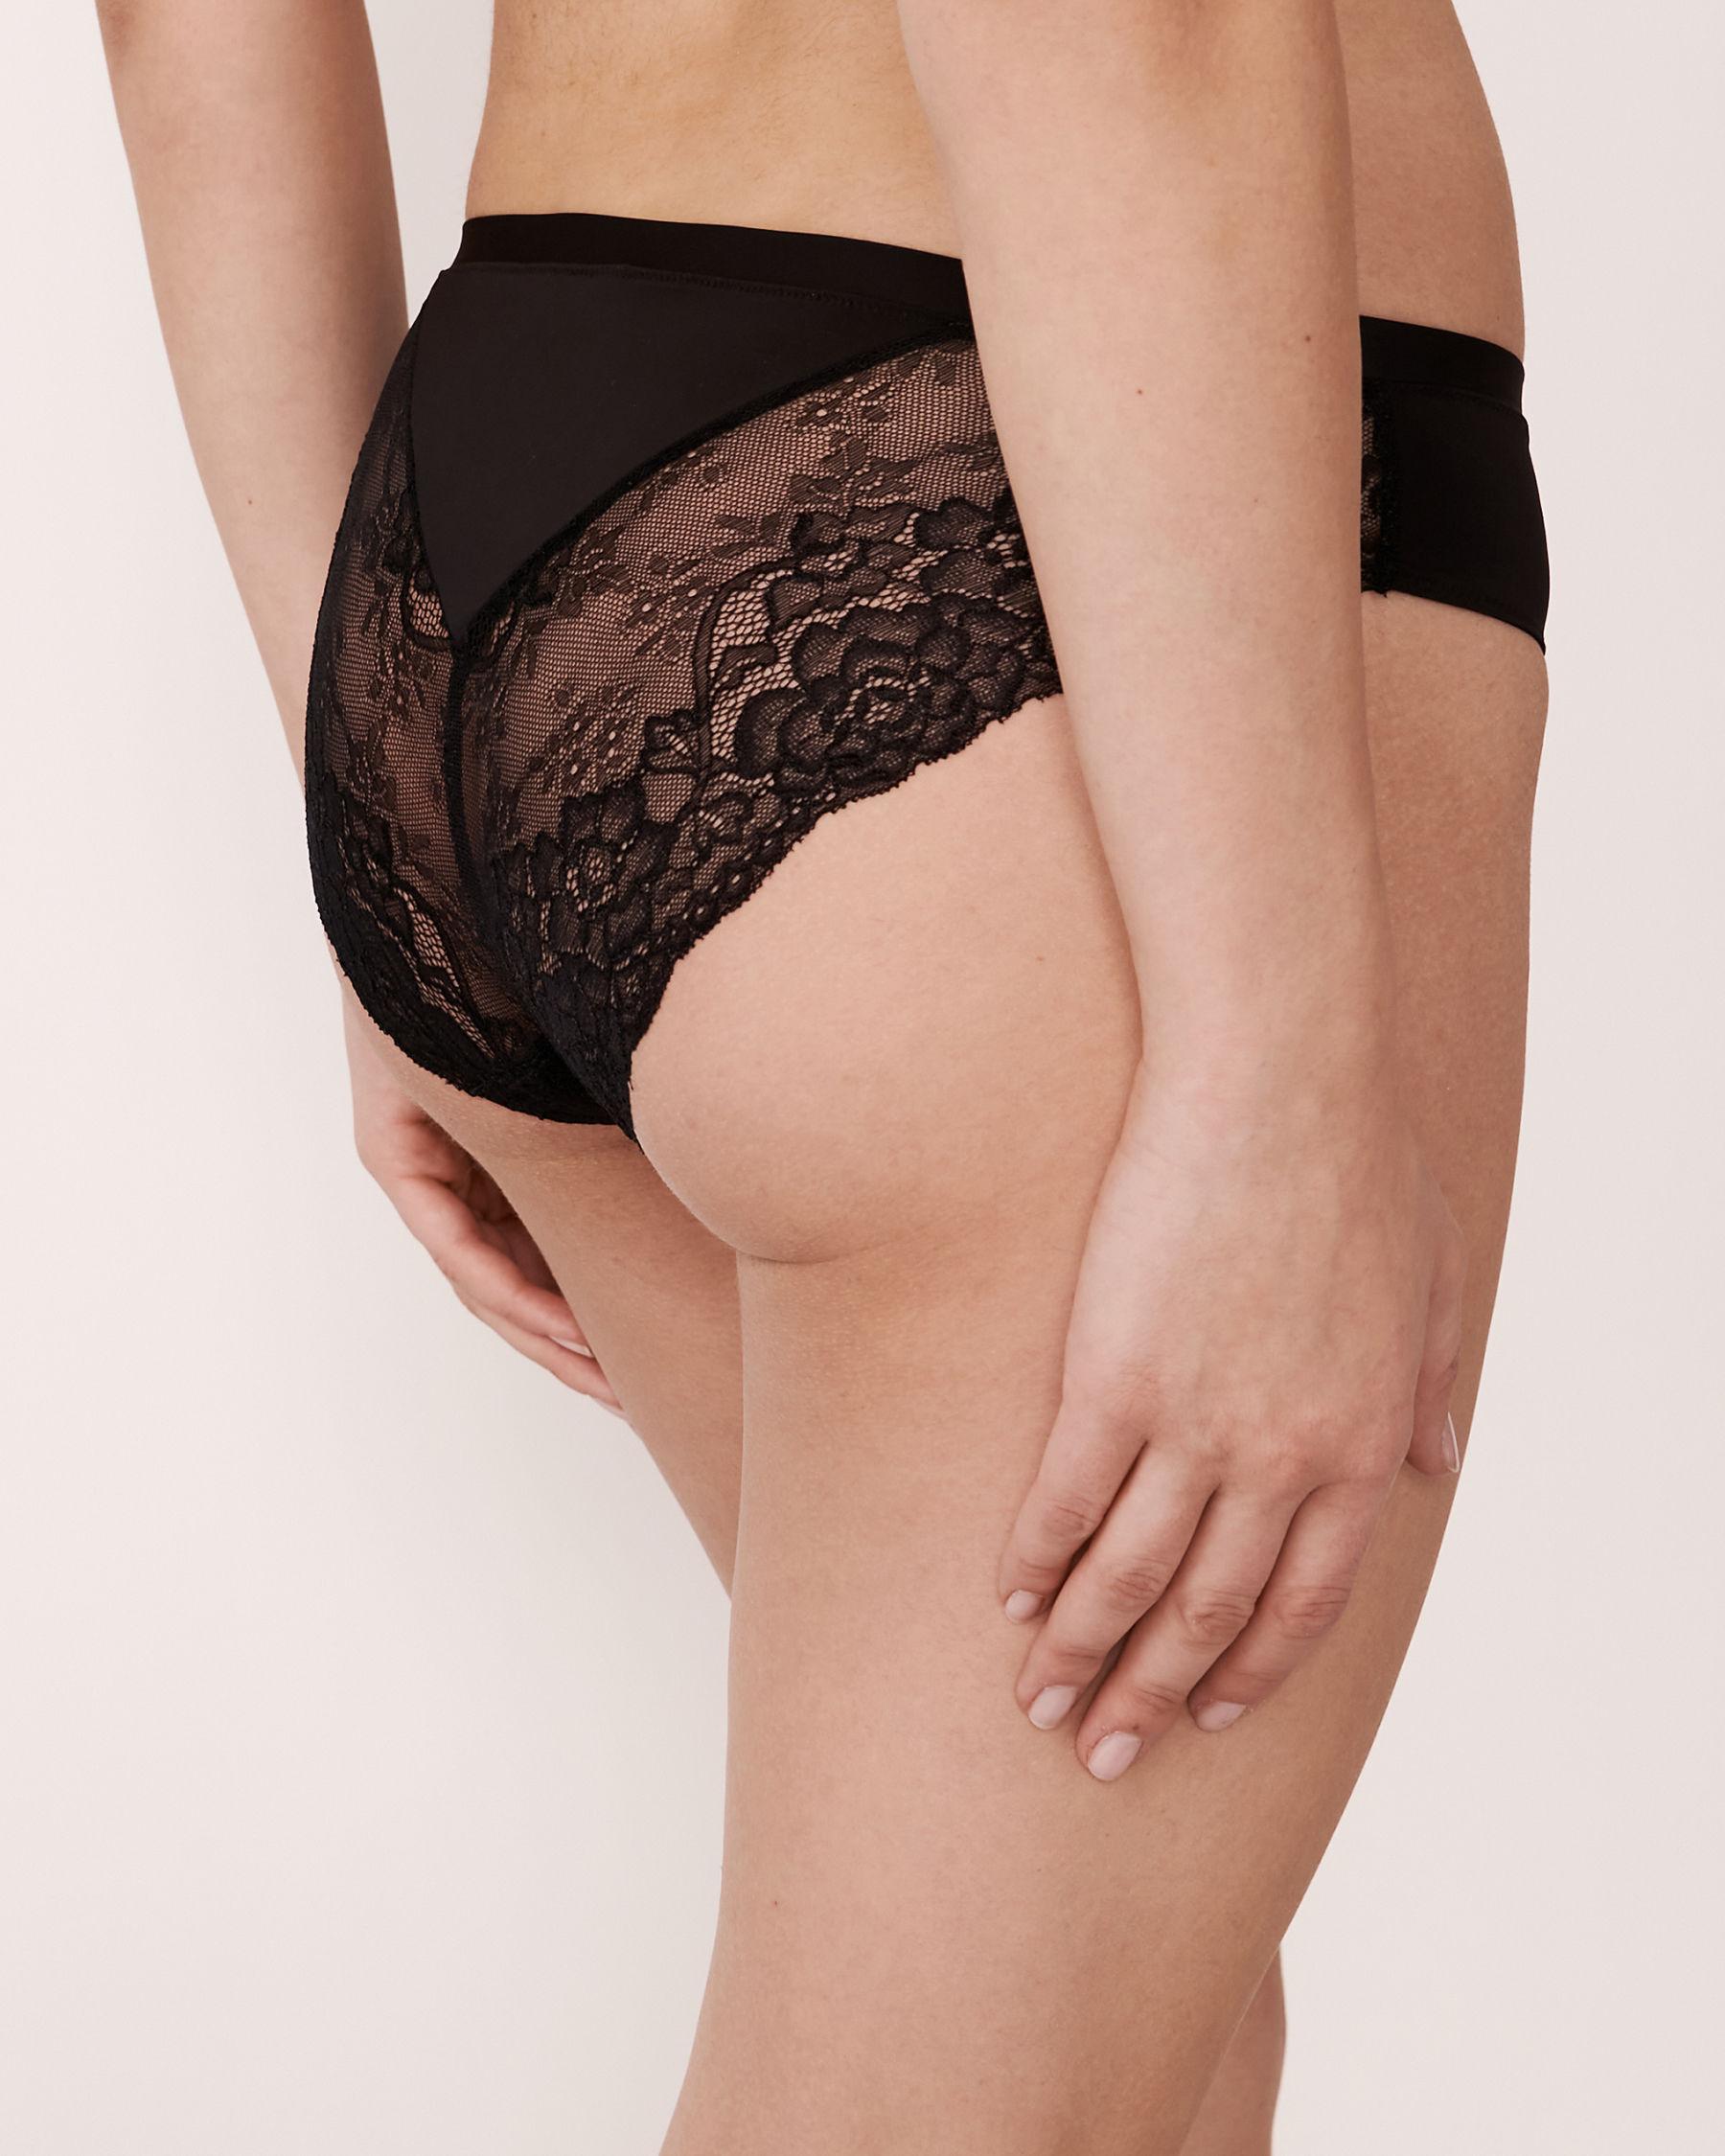 LA VIE EN ROSE Culotte bikini Noir 618-122-3-00 - Voir2